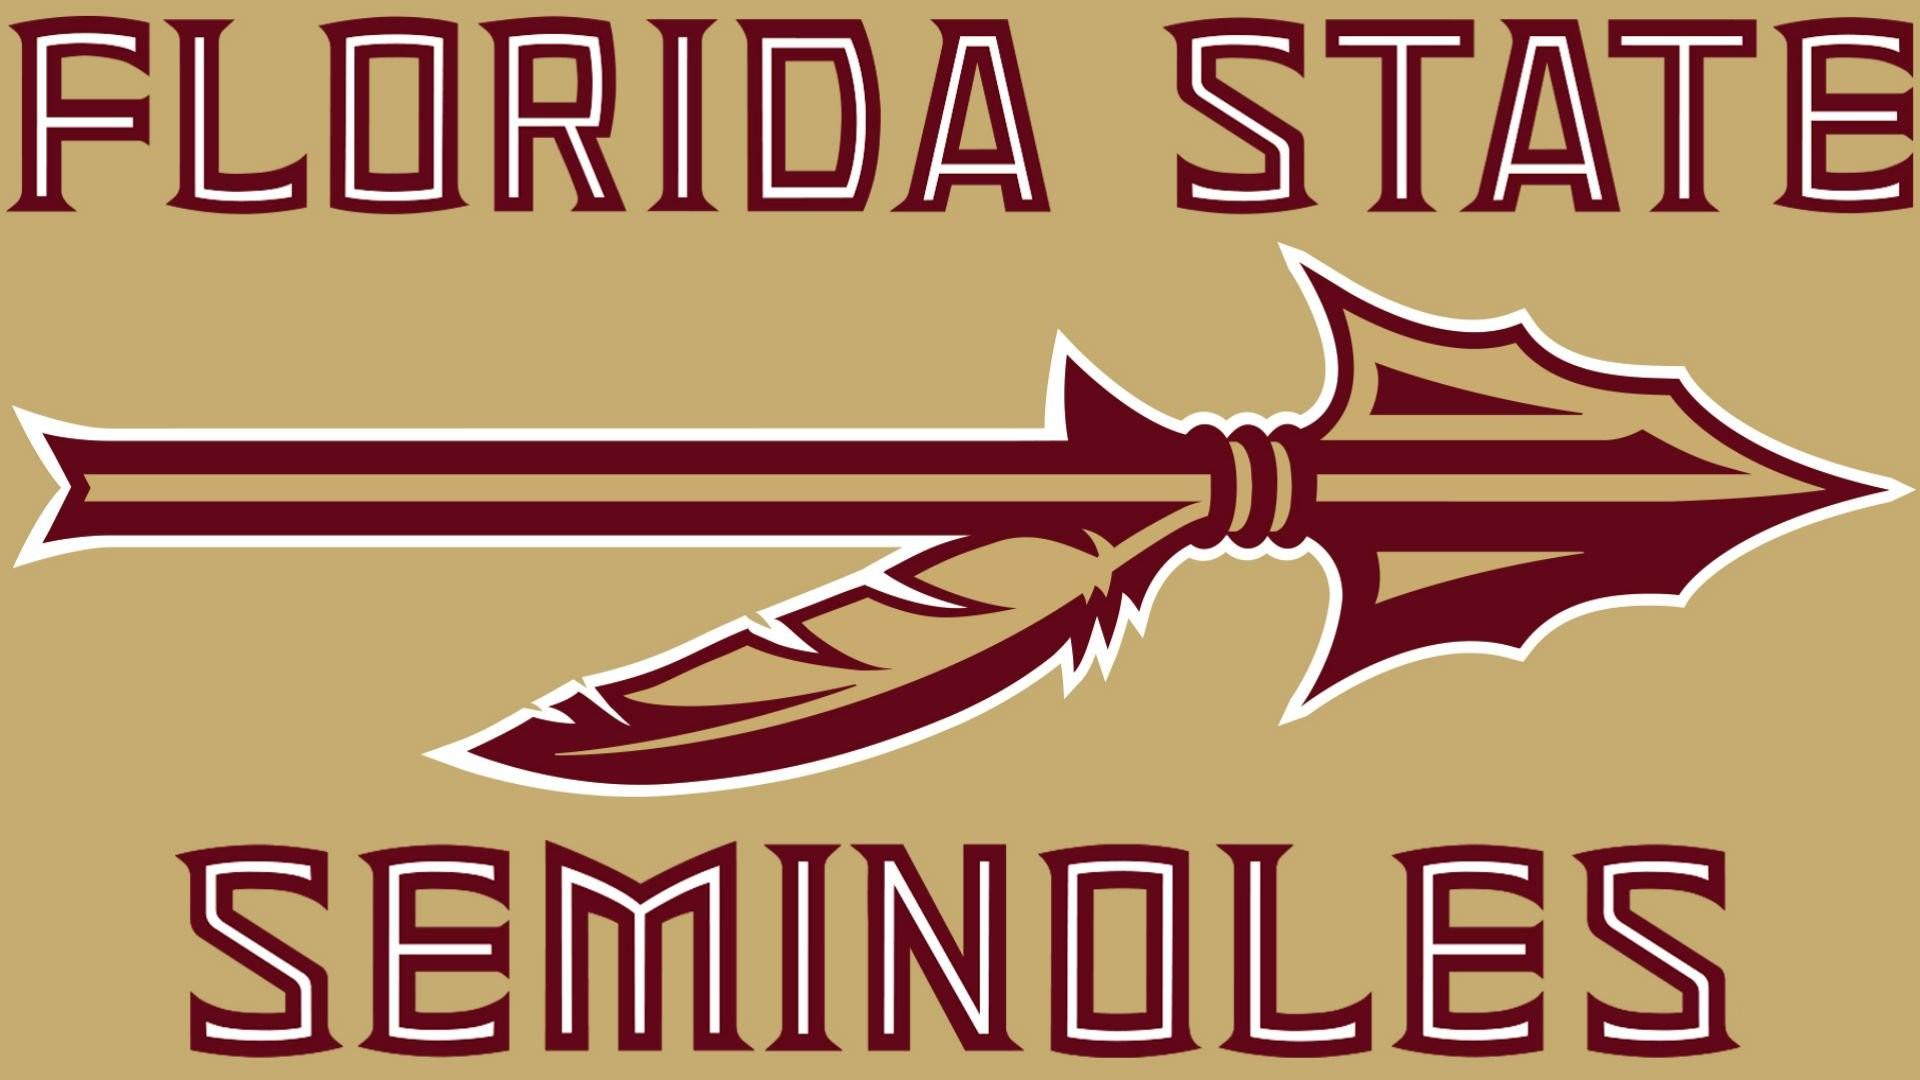 Florida state seminoles wallpaper 76 images 1920x1080 florida state seminoles college football wallpaper 1920x1080 voltagebd Choice Image